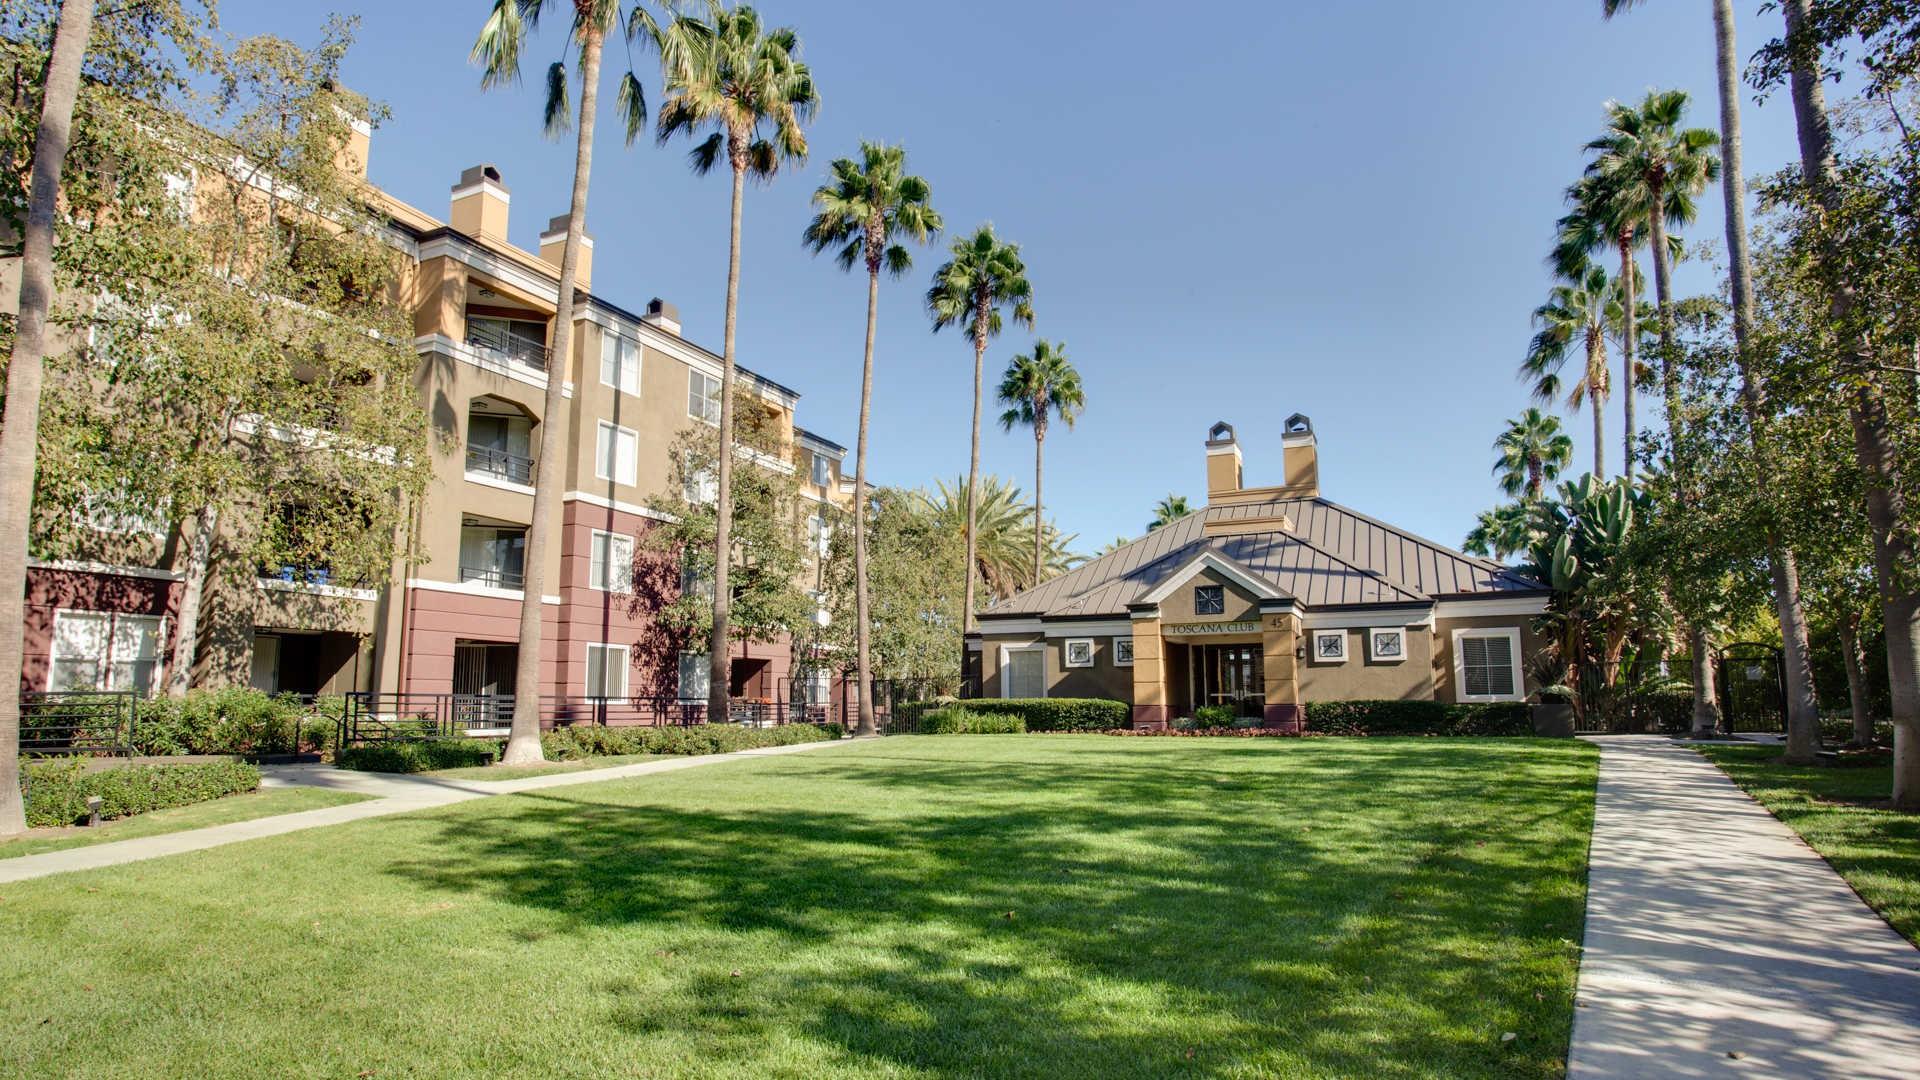 Apartments Near CUI Toscana for Concordia University Irvine Students in Irvine, CA